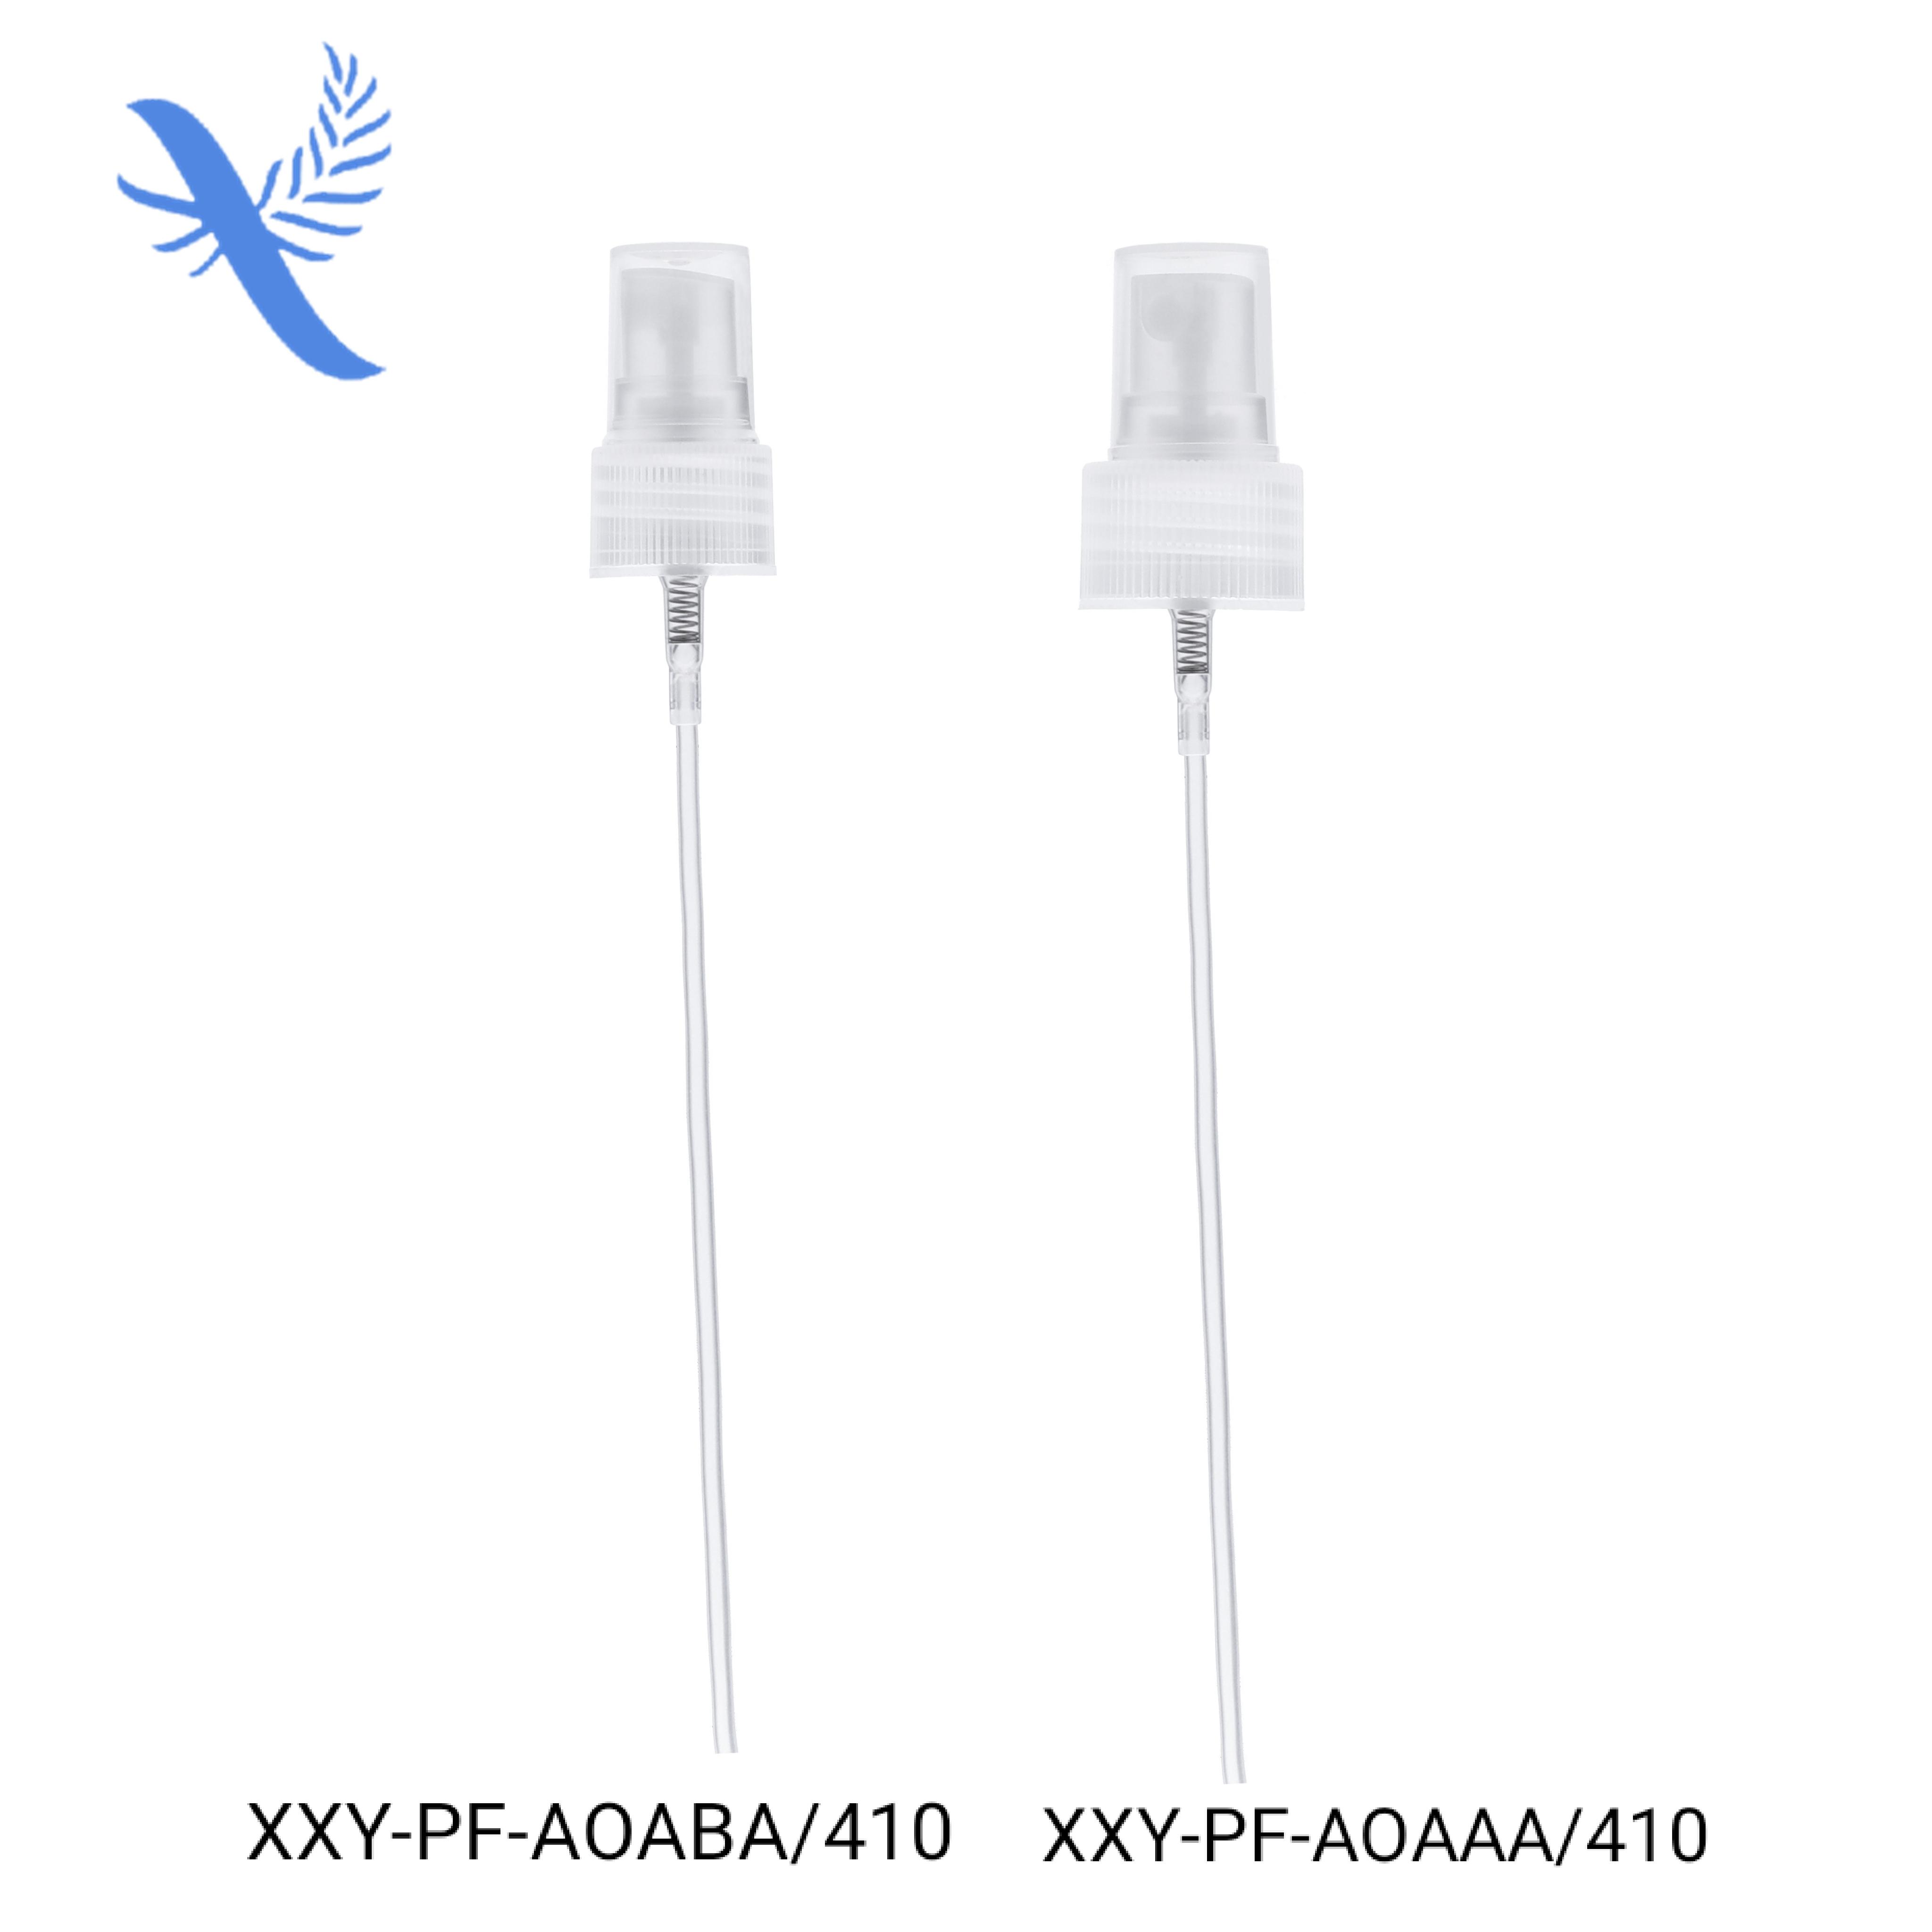 XXY-PF-AOABA/410